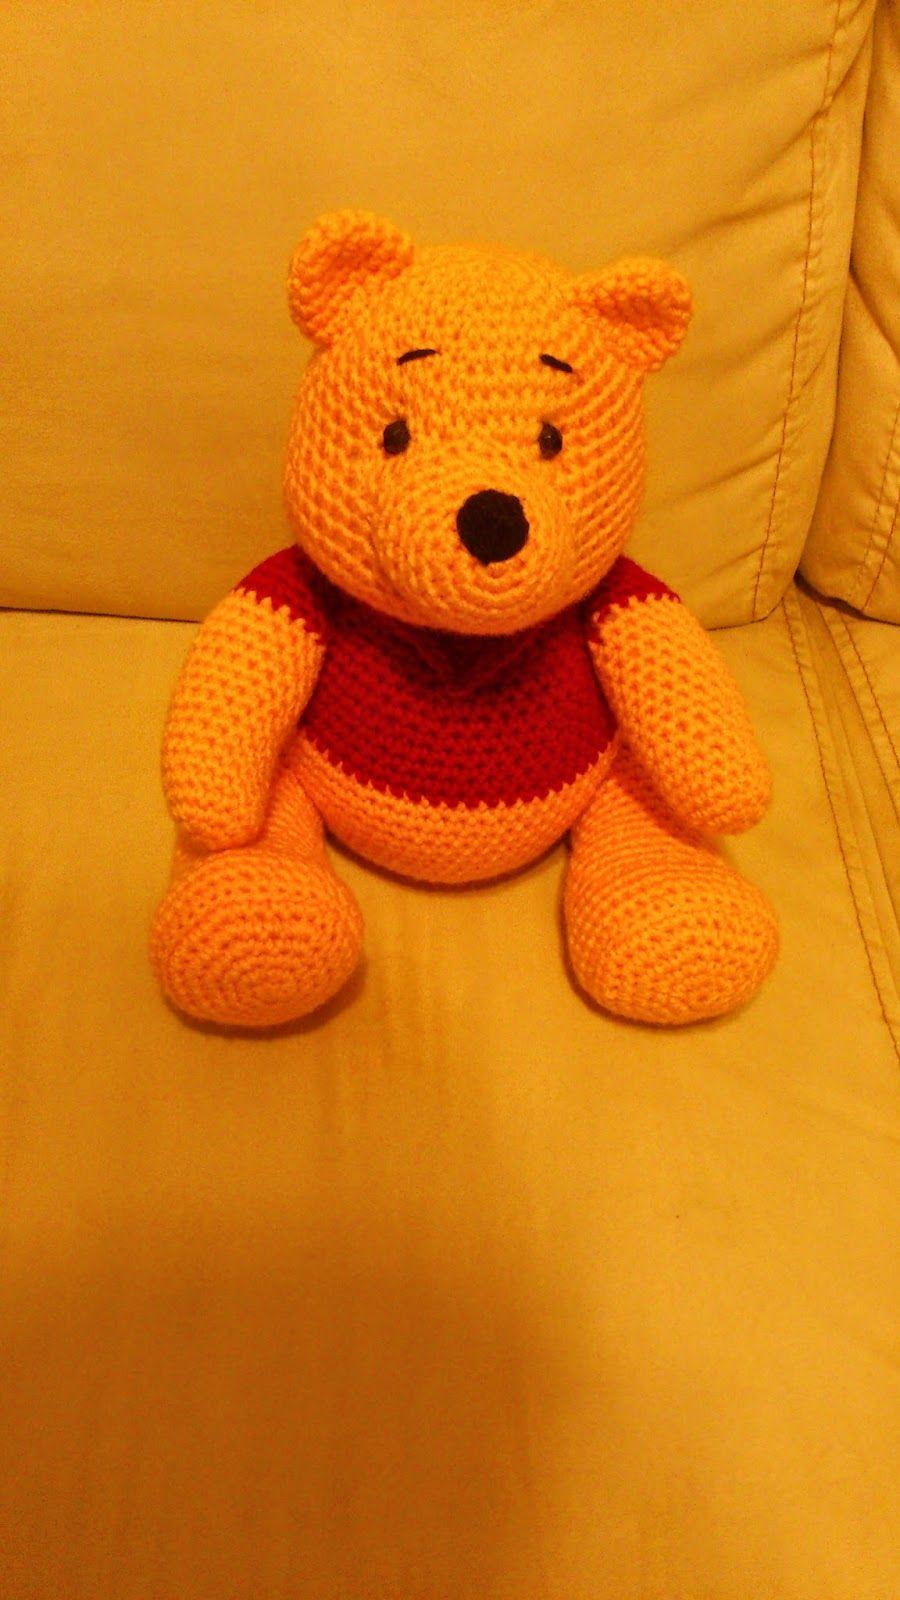 Amigurumi Winnie the Pooh - FREE Crochet Pattern / Tutorial ...